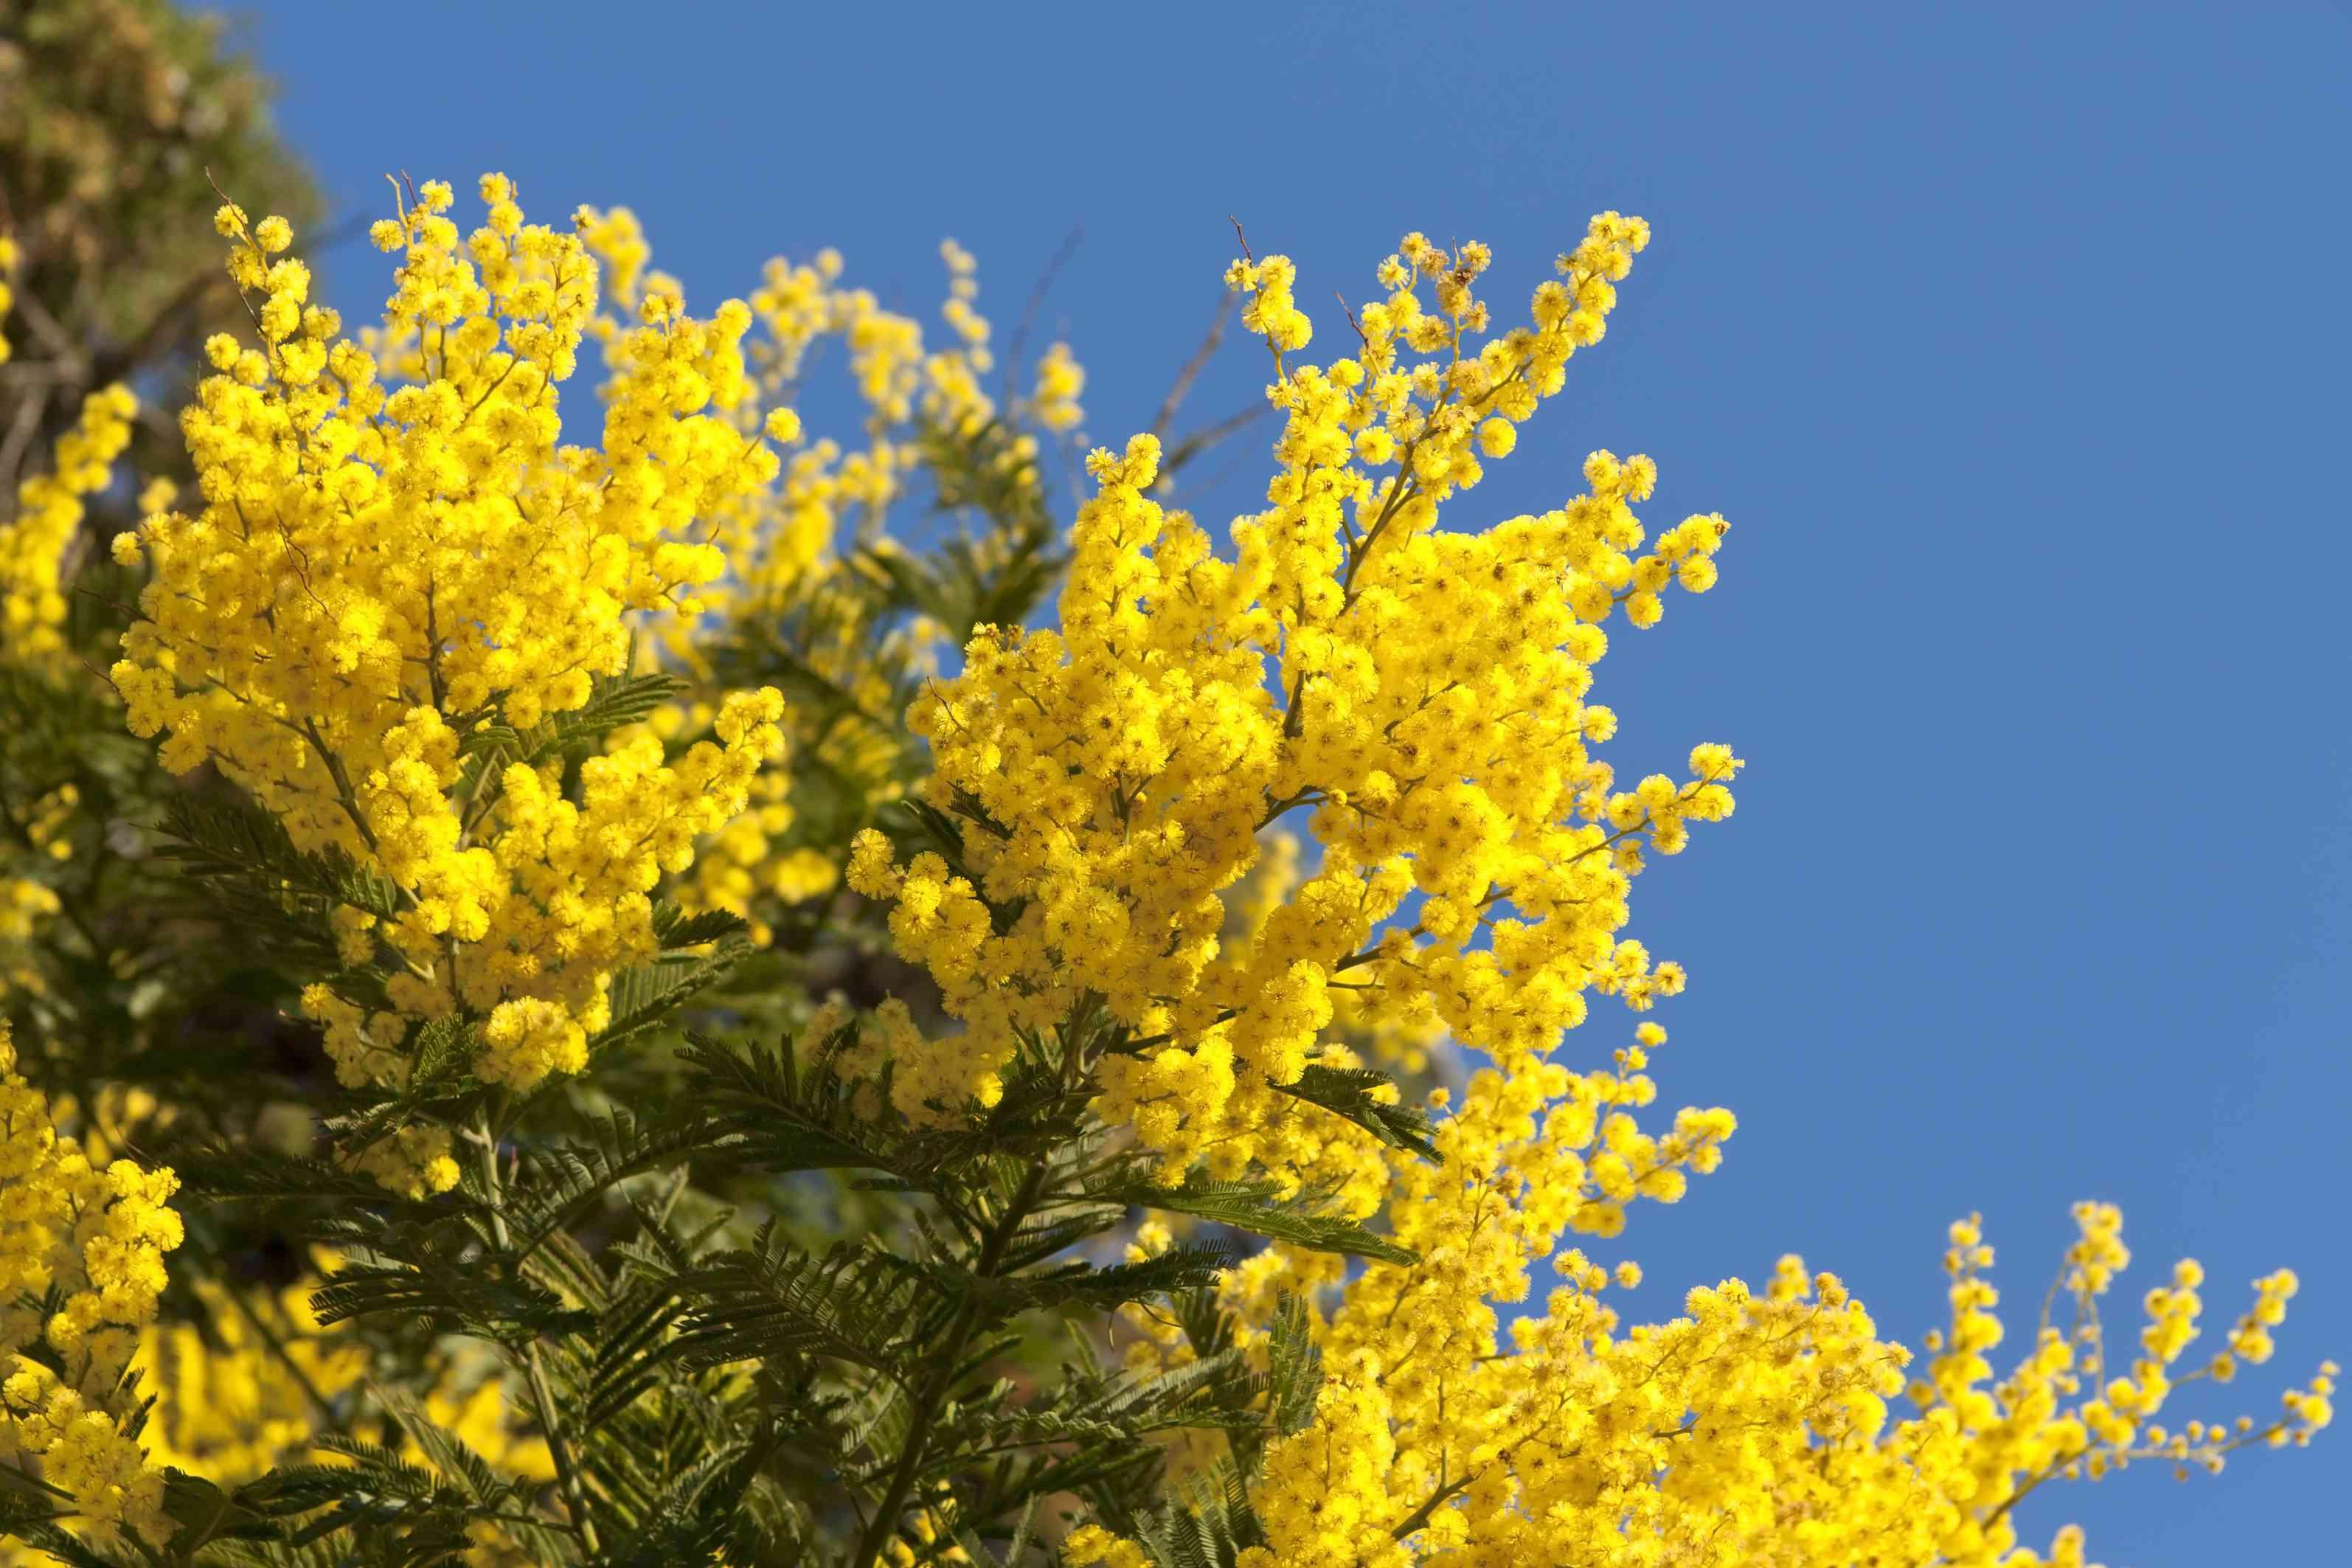 False Mimosa (Acacia dealbata, Mimosaceae)